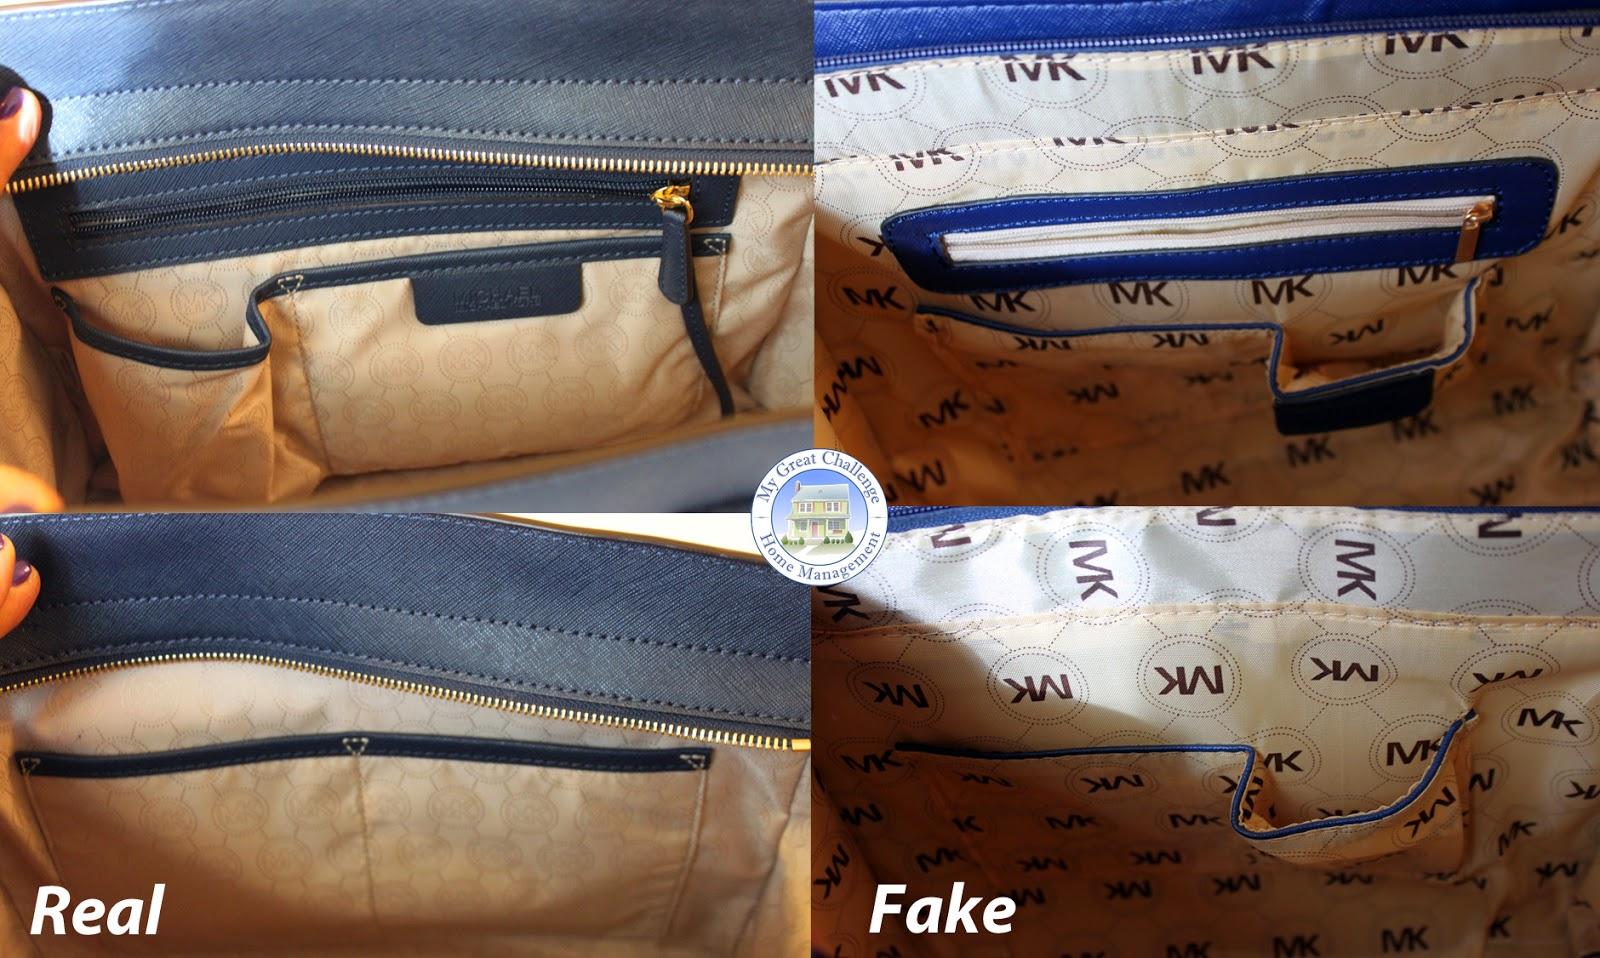 848ce8c40e6a My Great Challenge: Michael Kors Selma - Fake VS. Real Comparison